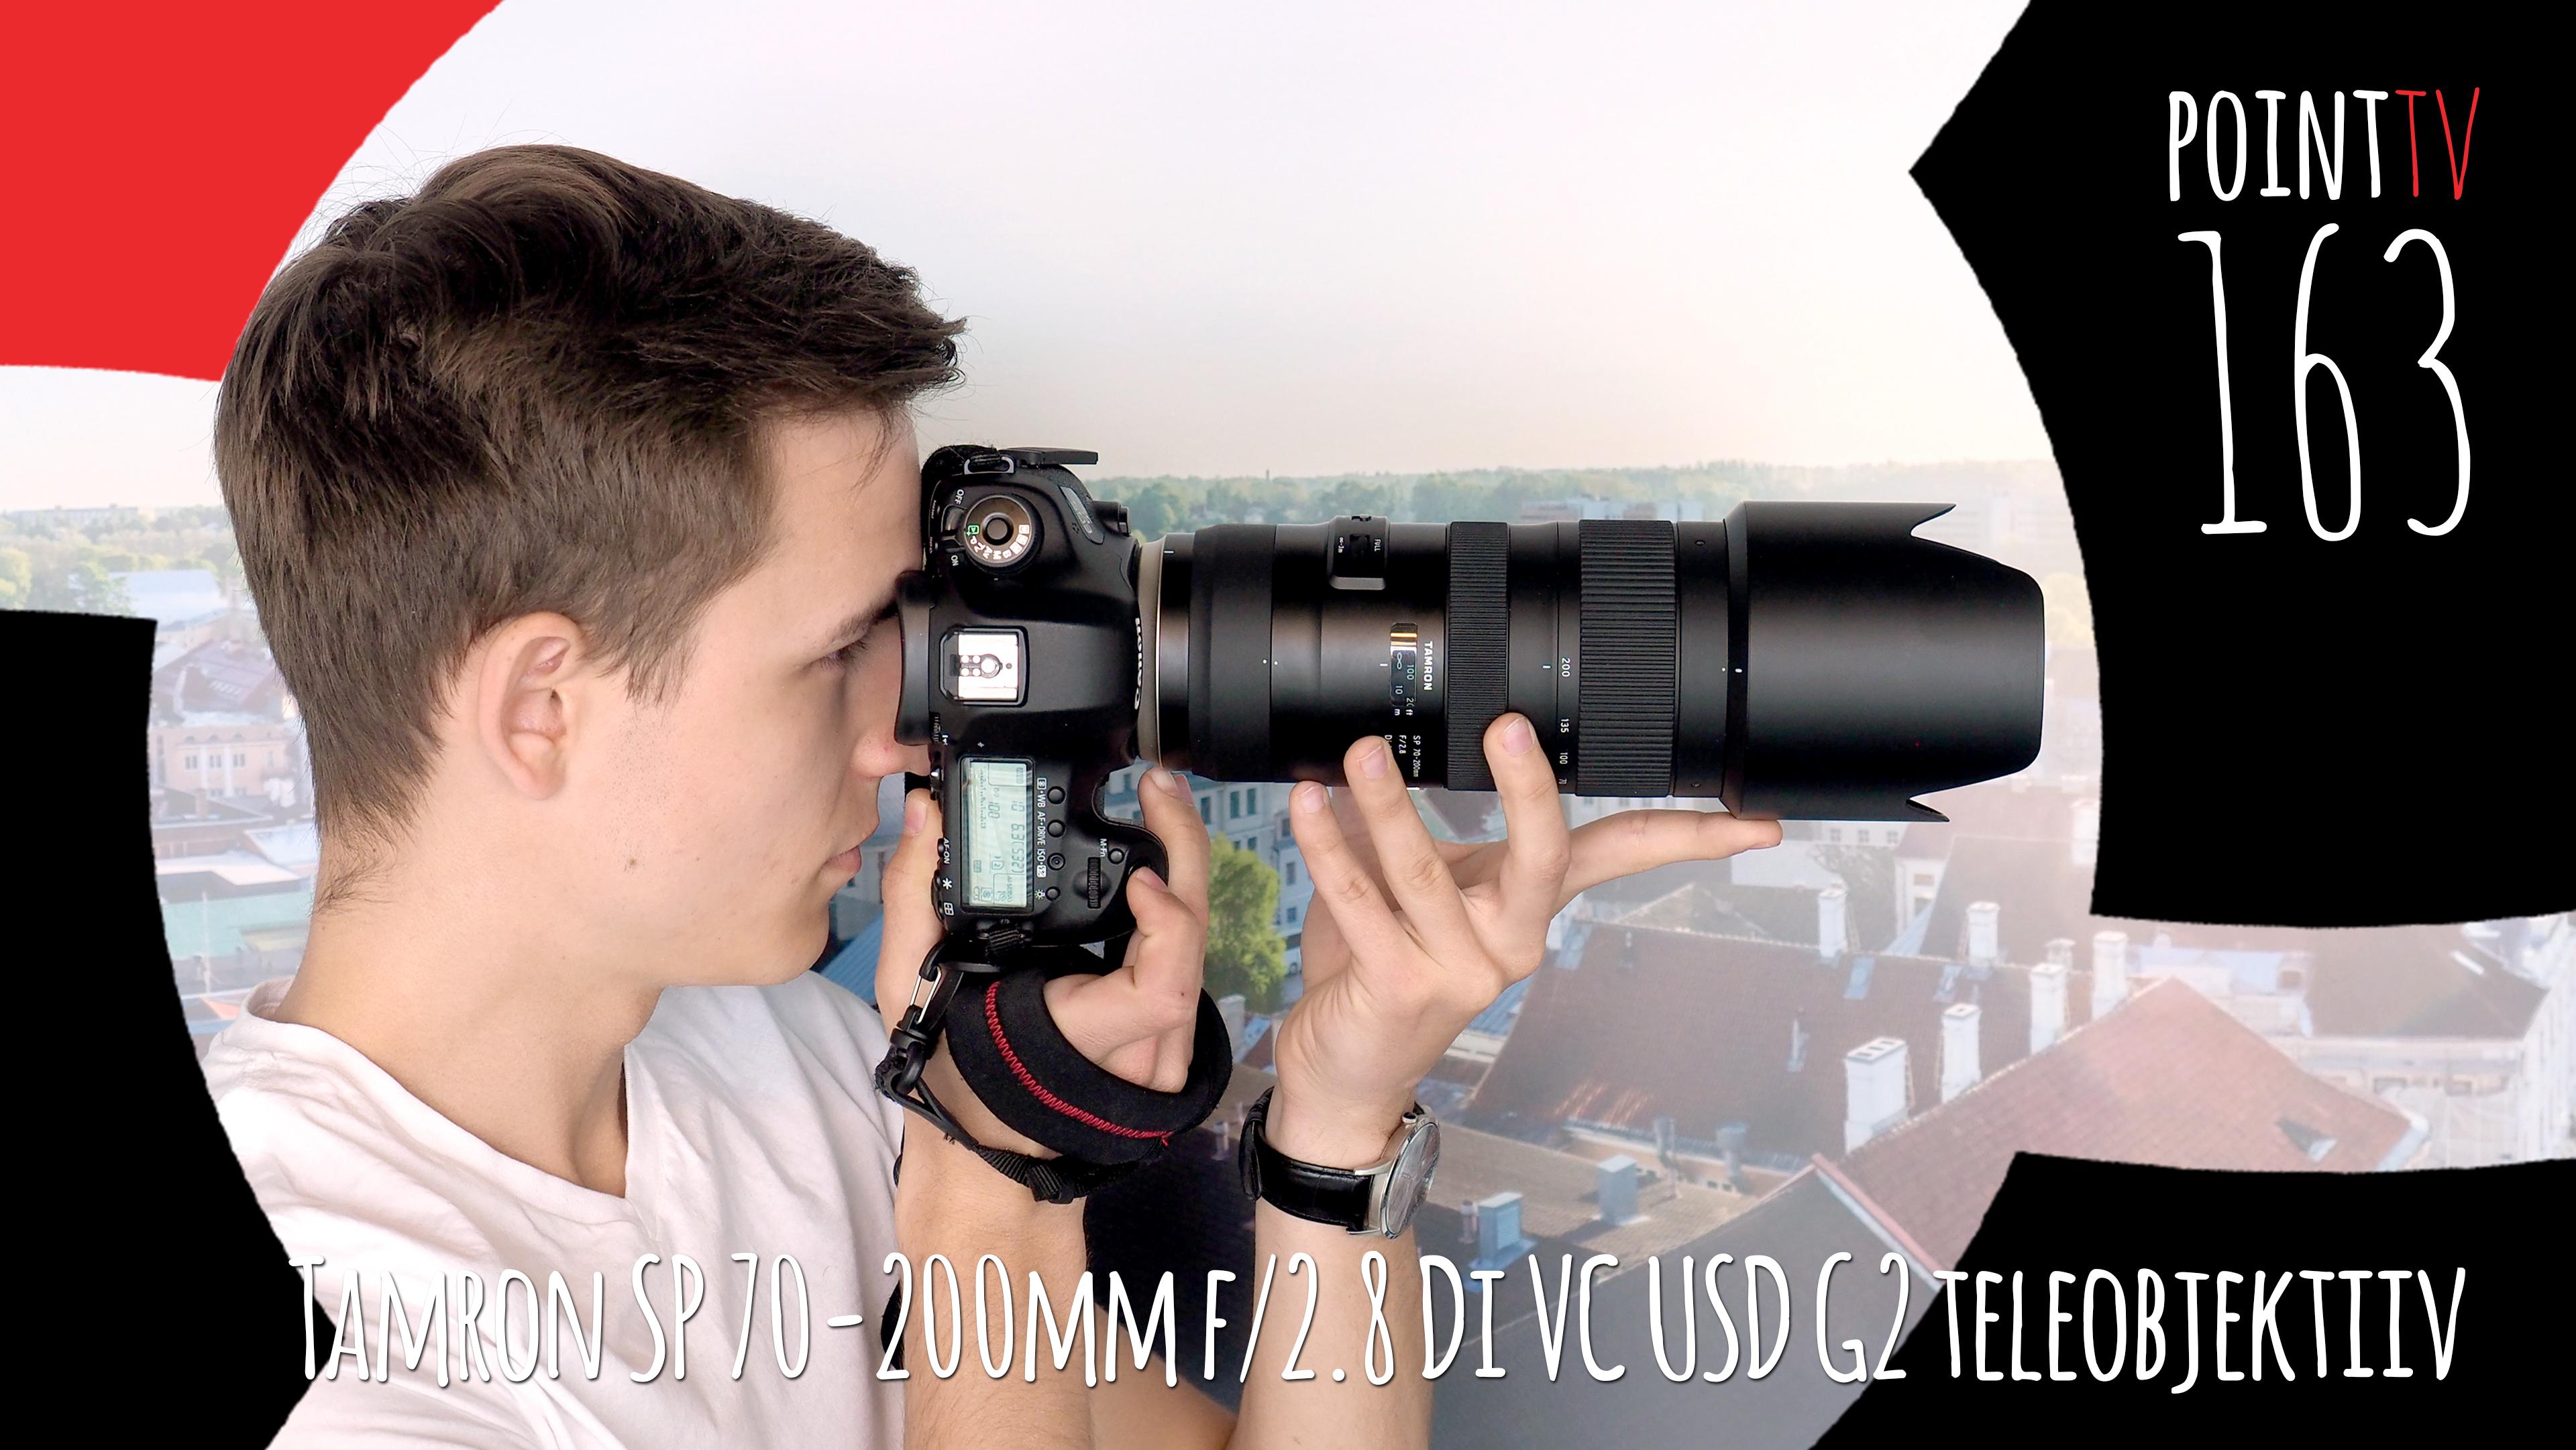 Point TV 163: Tamron SP 70-200mm f/2.8 Di VC USD G2 telesuumobjektiiv